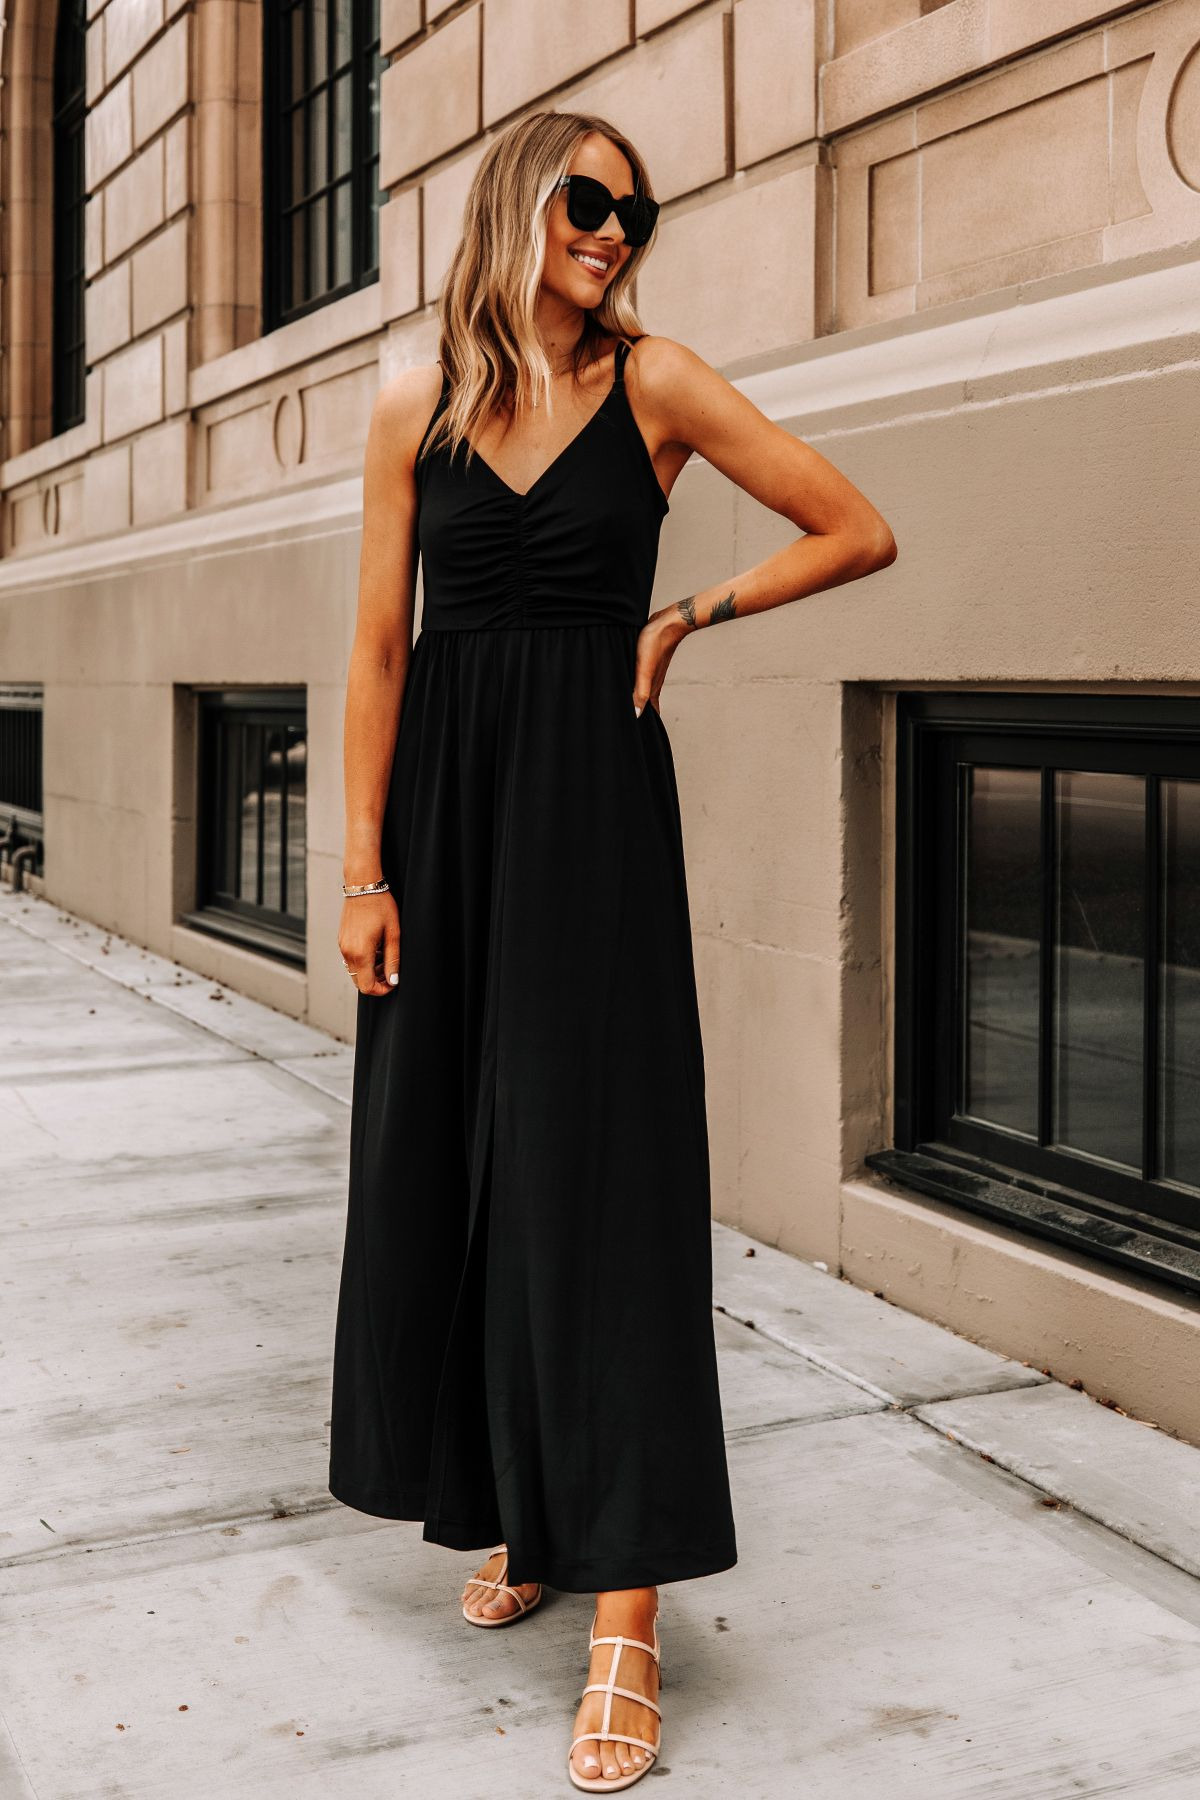 Fashion Jackson Wearing Banana Republic Black Maxi Dress Tan Sandals Summer Dress Outfits Black Dress Outfit Casual Black Dresses Casual [ 1800 x 1200 Pixel ]